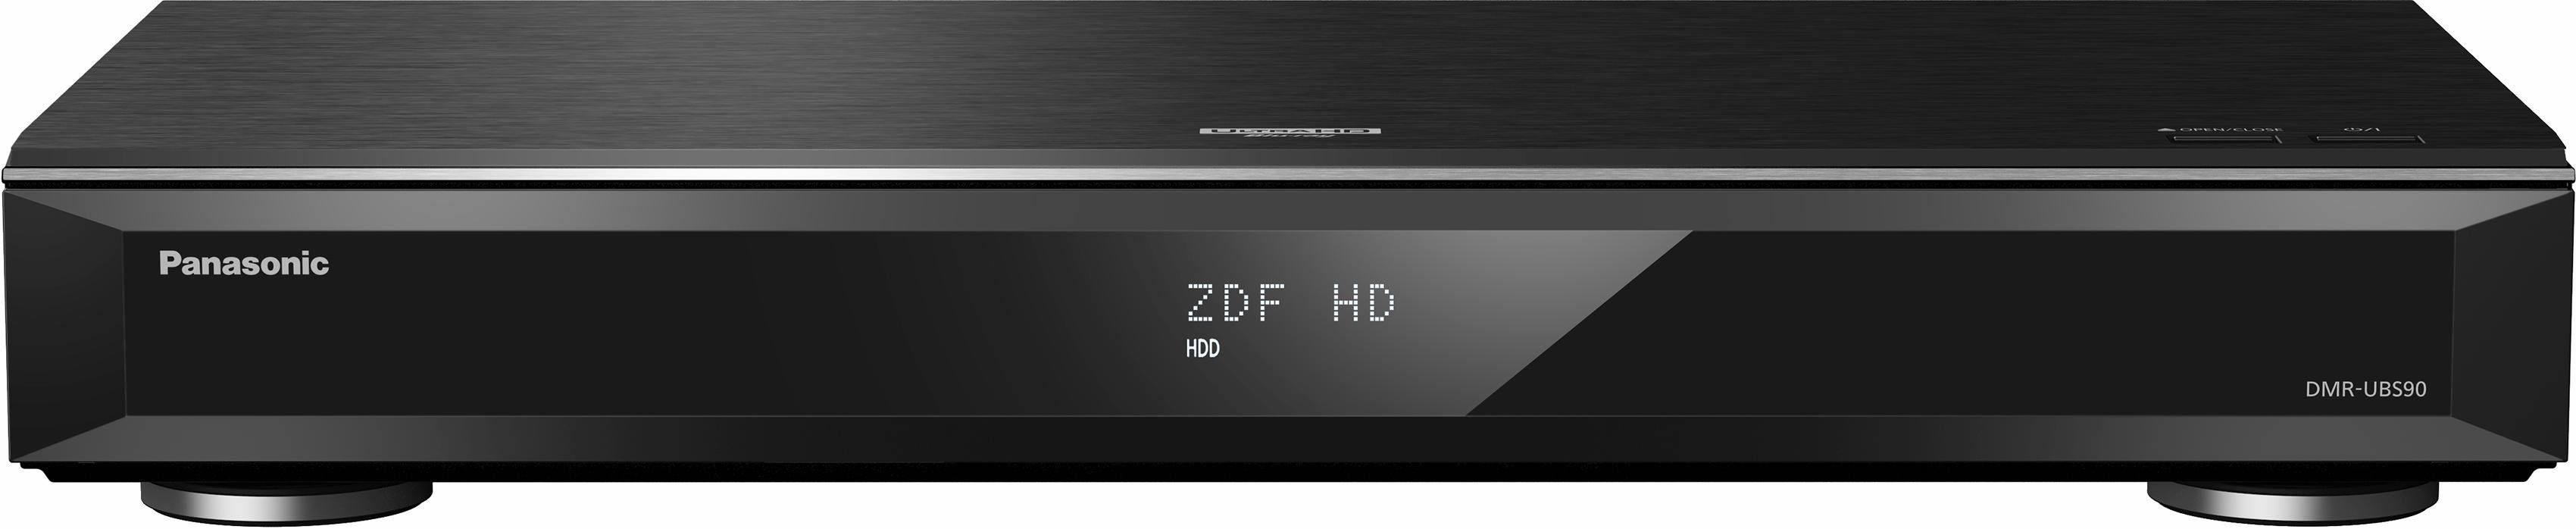 Panasonic DMR-UBS90EGK UHD Blu-ray Recorder mit Twin DVB-S Tuner